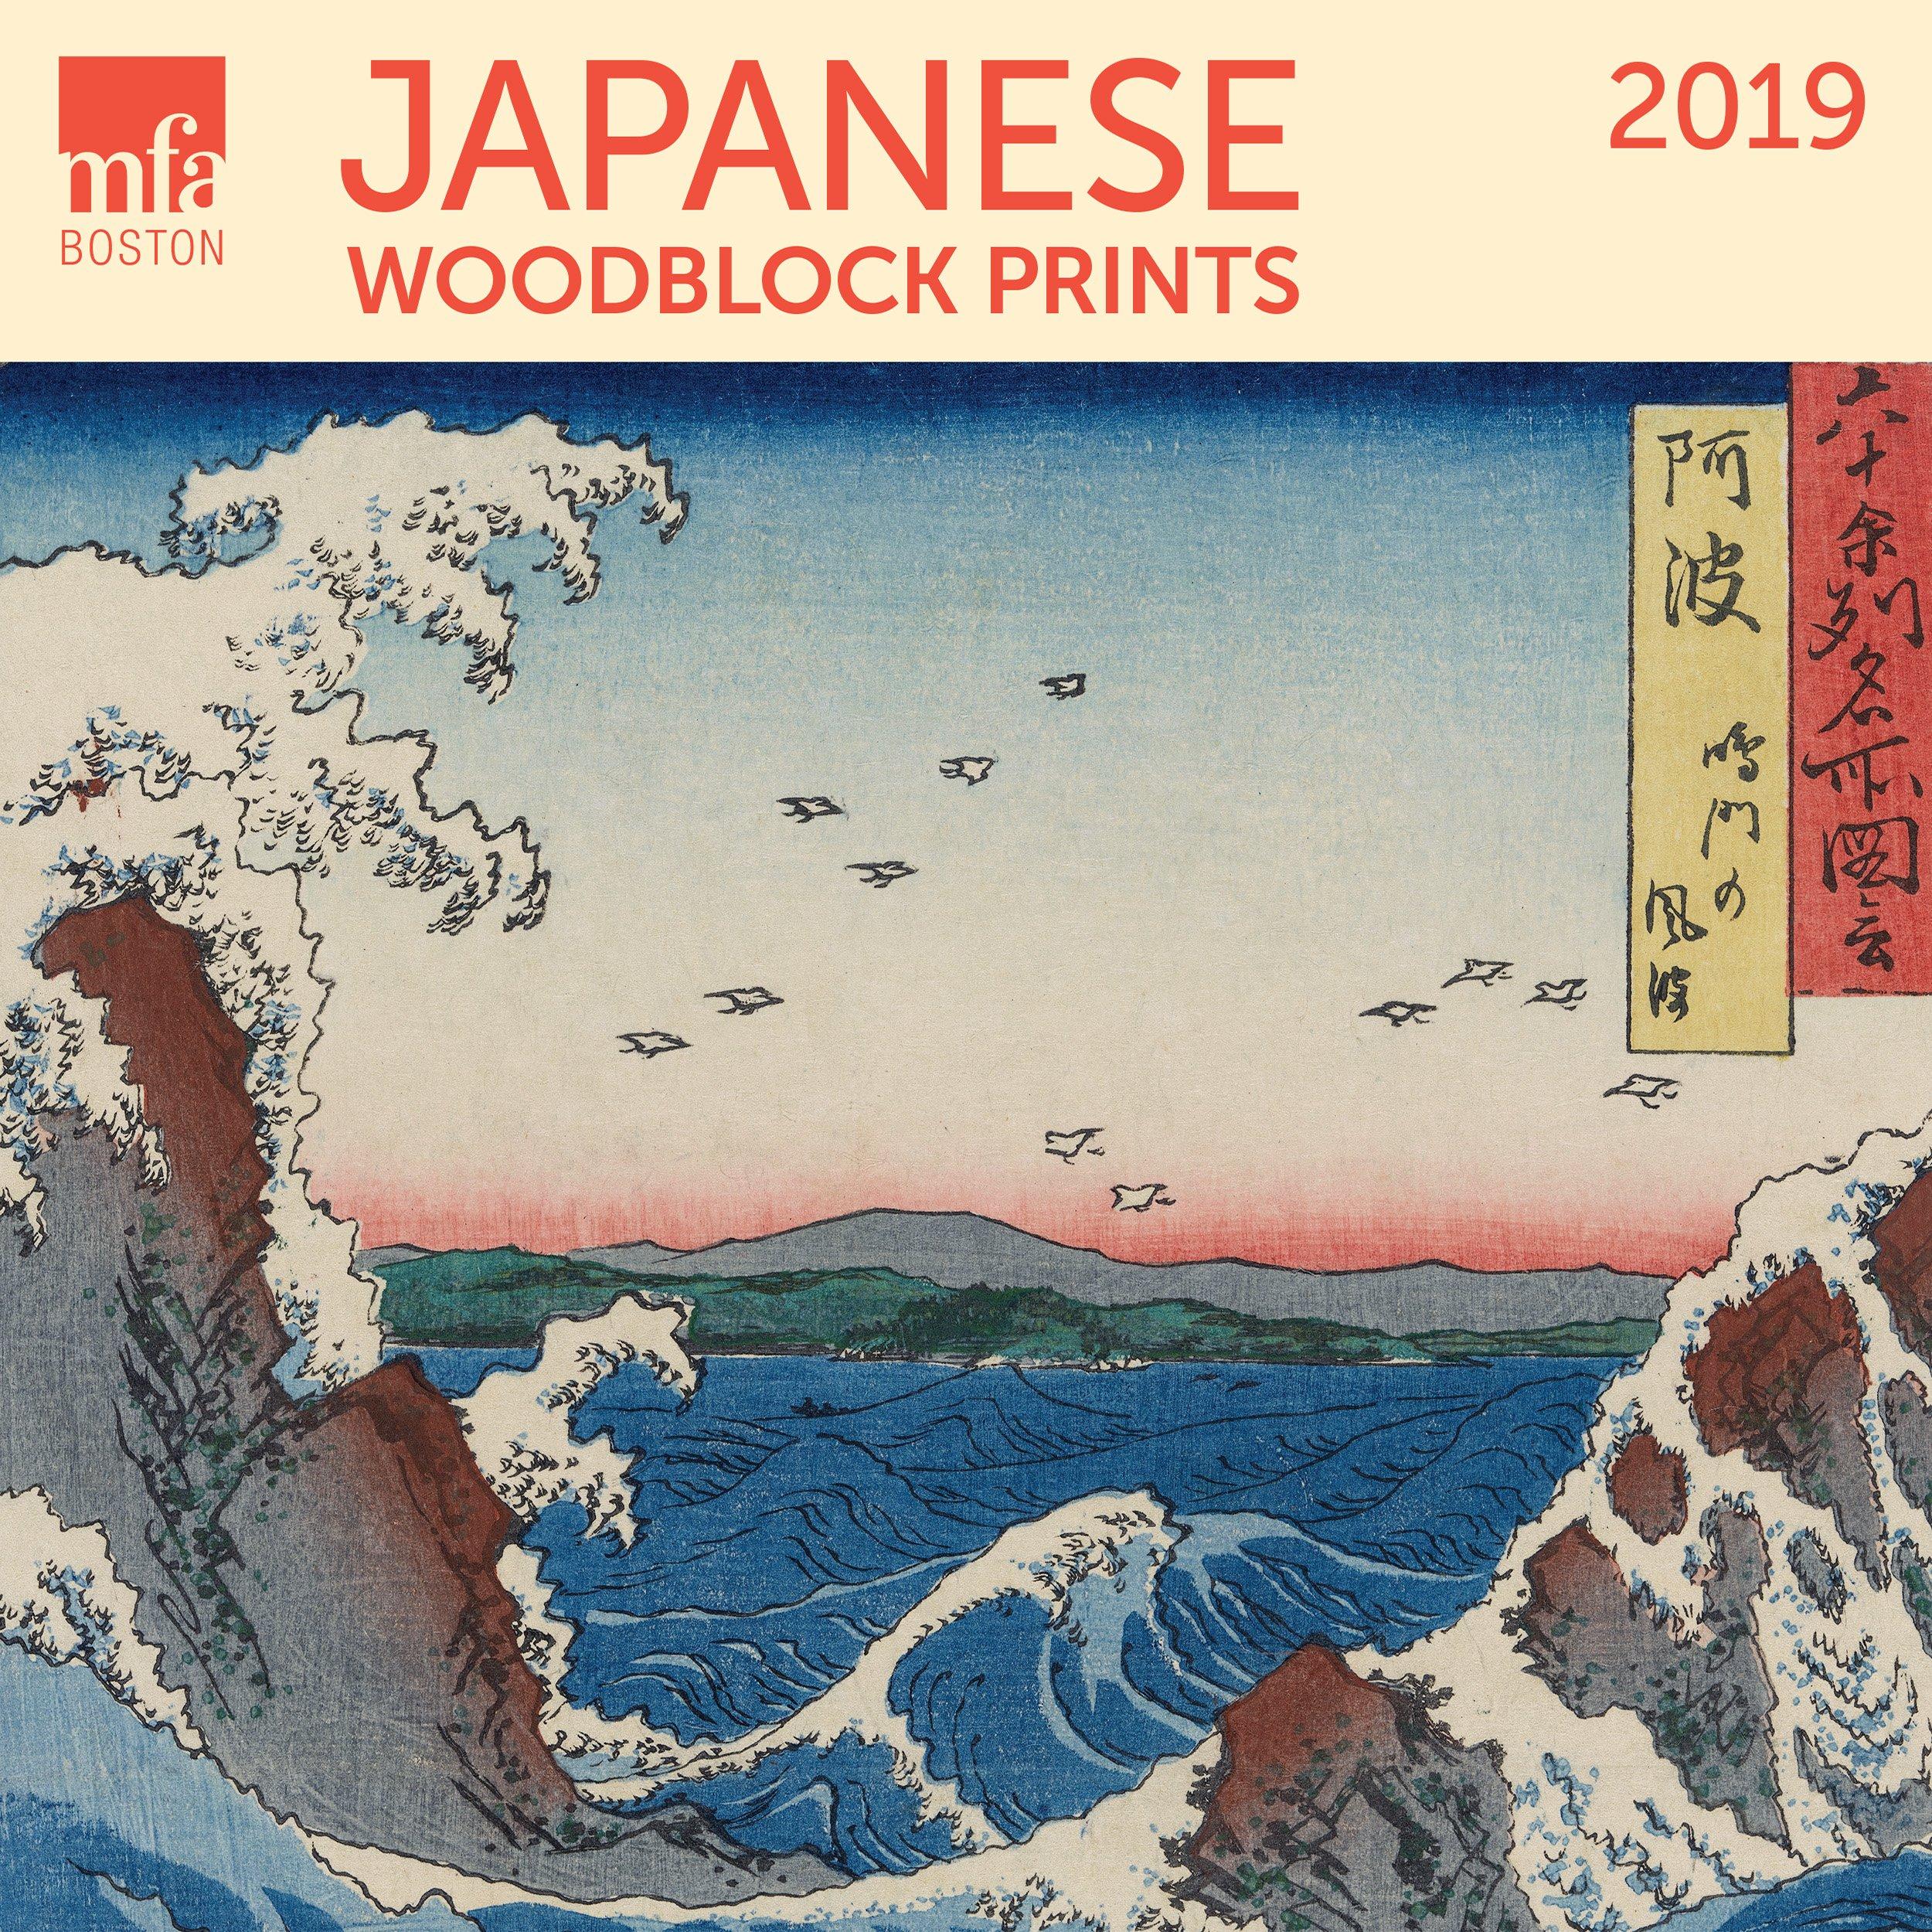 Japanese Woodblocks MFA, Boston Wall Calendar 2019 Monthly January-December 12'' x 12''